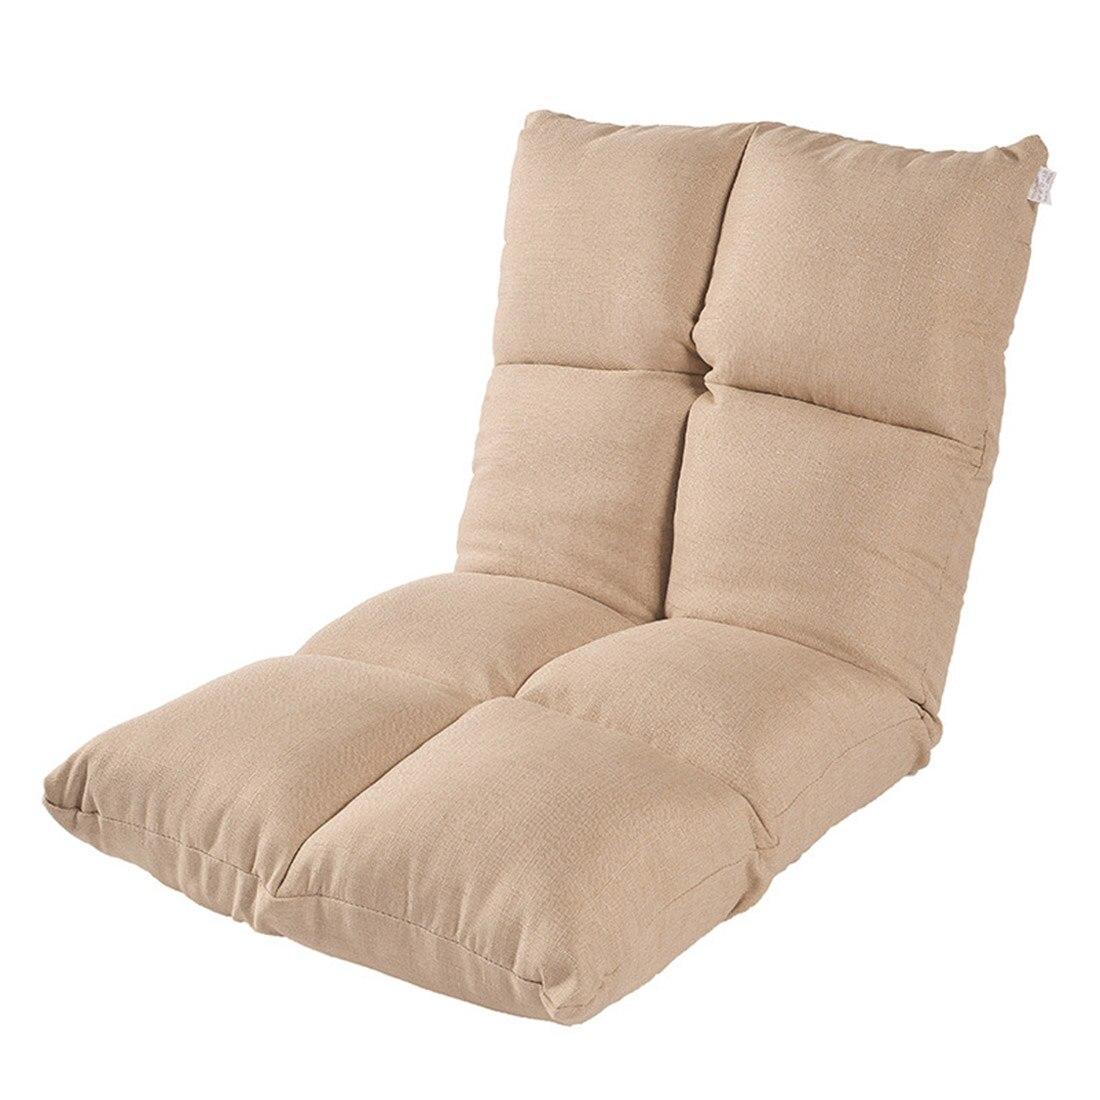 Strange Living Room Modern Lazy Sofas Folding Living Room Sofa Inzonedesignstudio Interior Chair Design Inzonedesignstudiocom